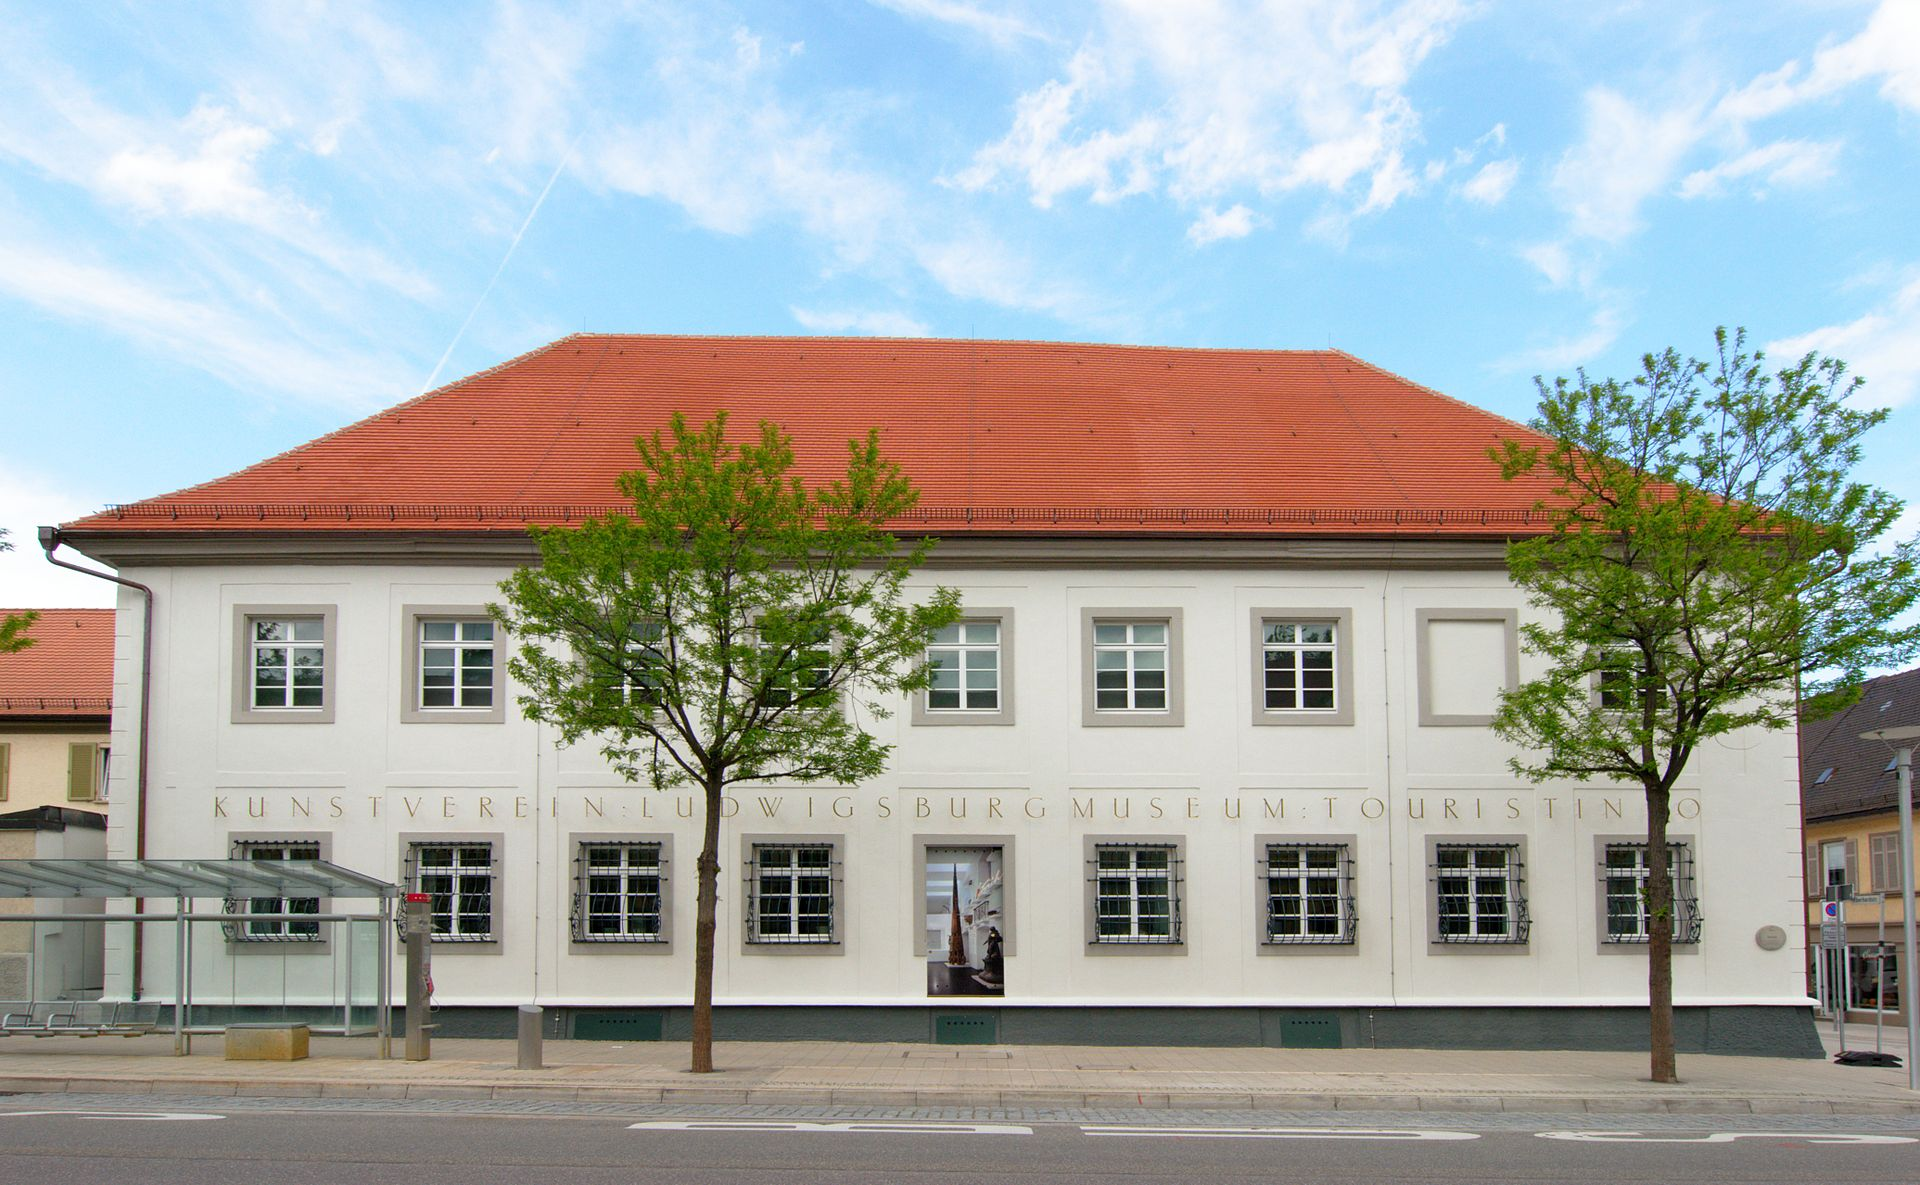 Bild Kunstverein Kreis Ludwigsburg